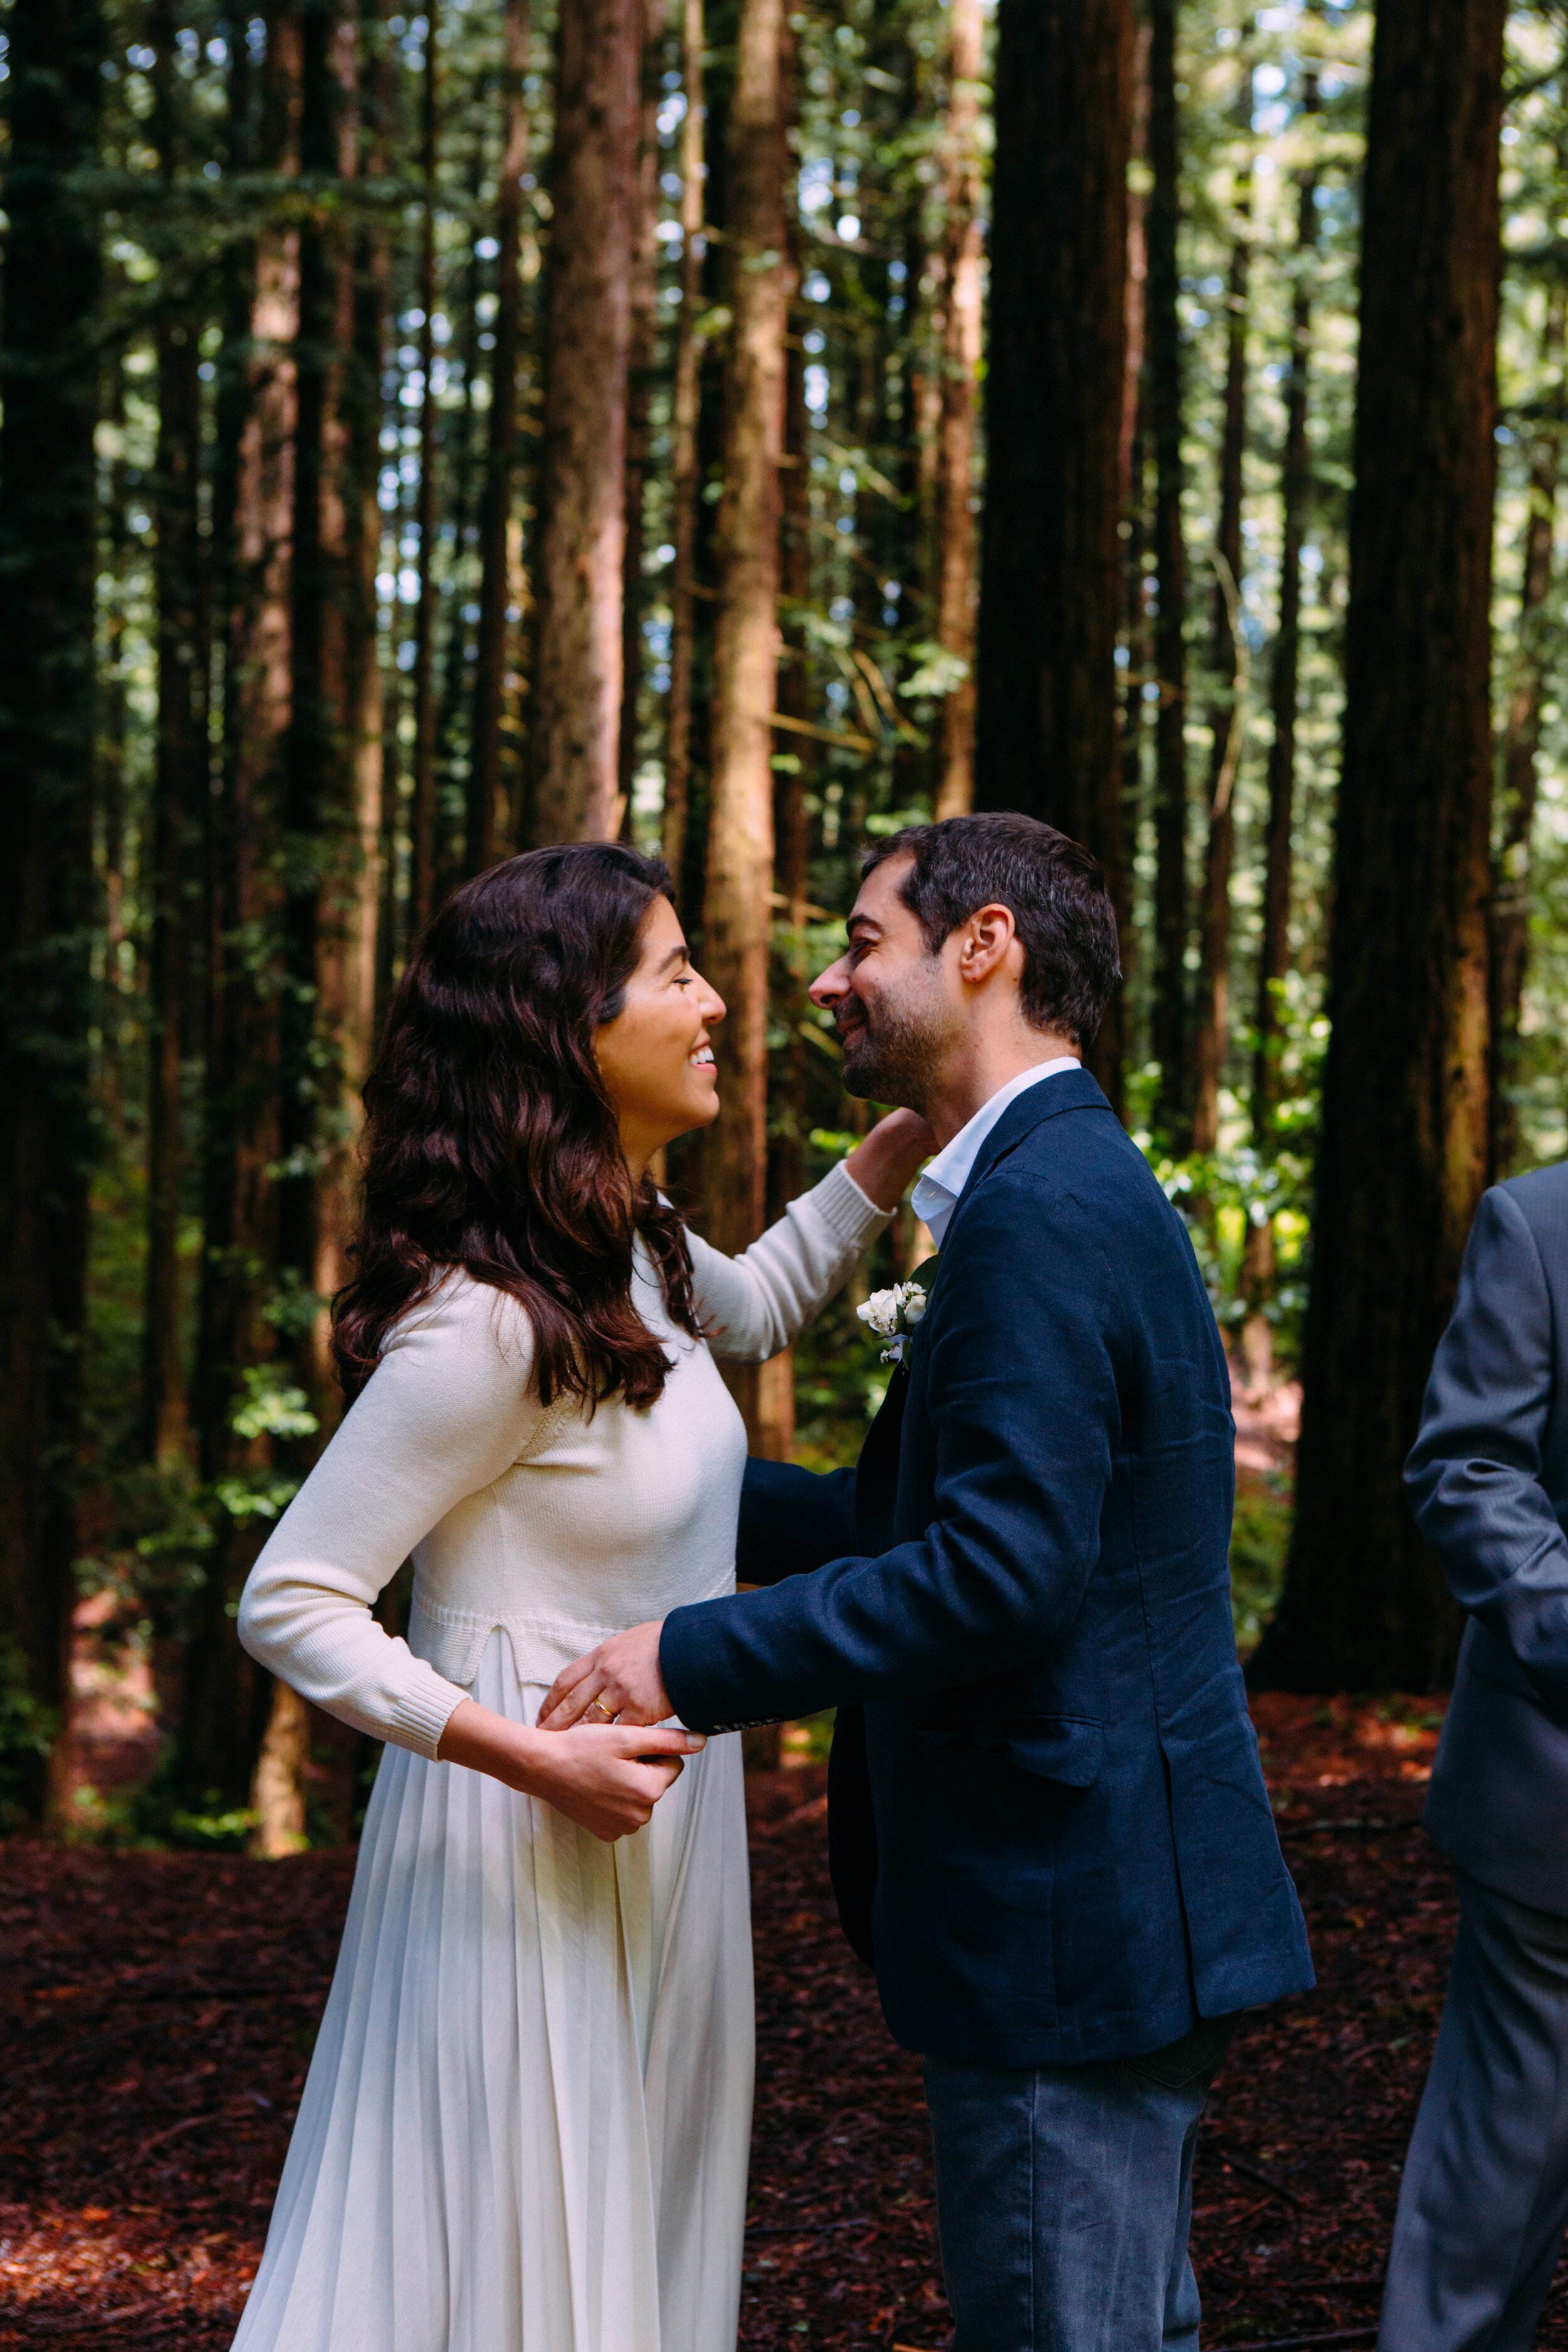 20190716-San Francisco-Redwood Regional Park-Marcella Daniele--32.jpg